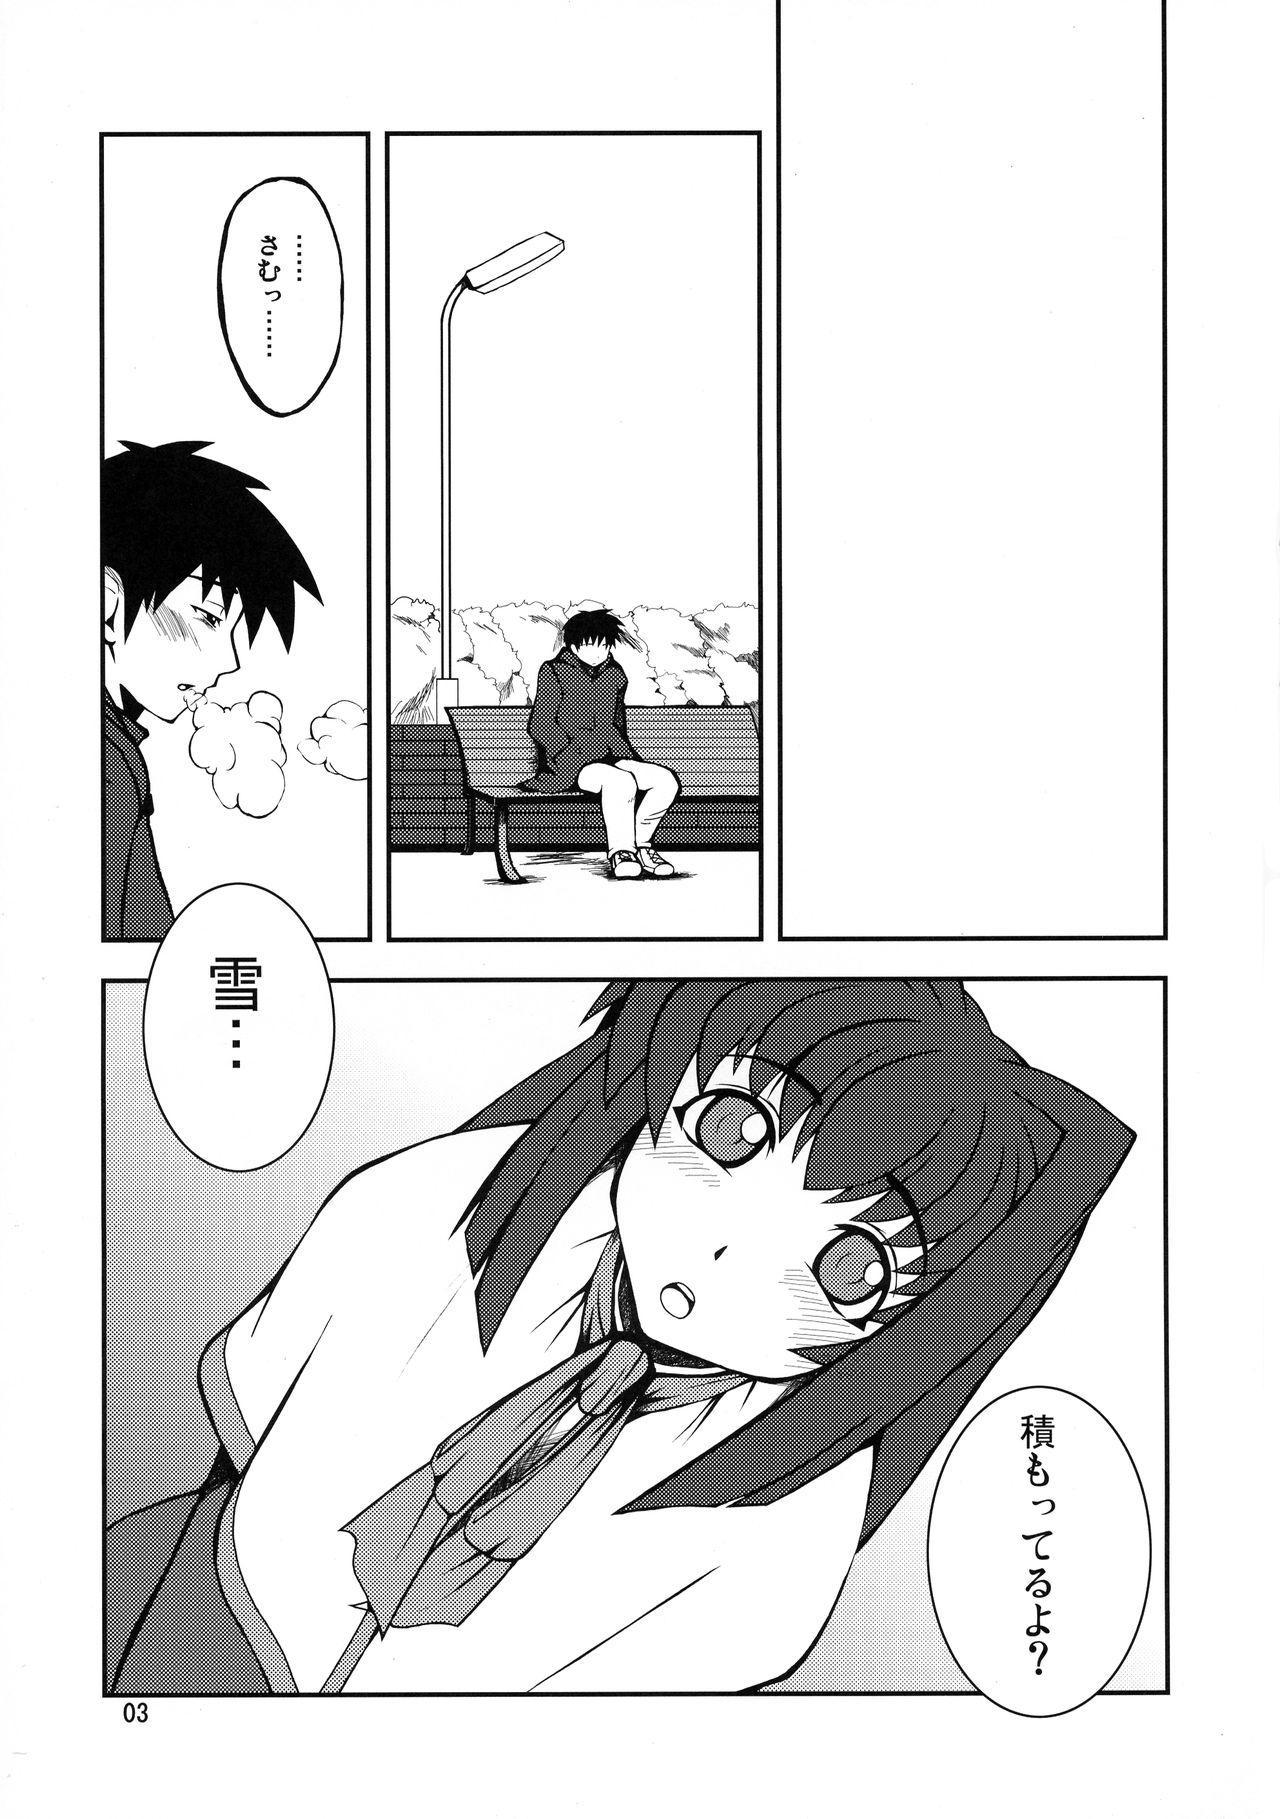 Kyouki Vol. 3~5 Remake Ver. 2